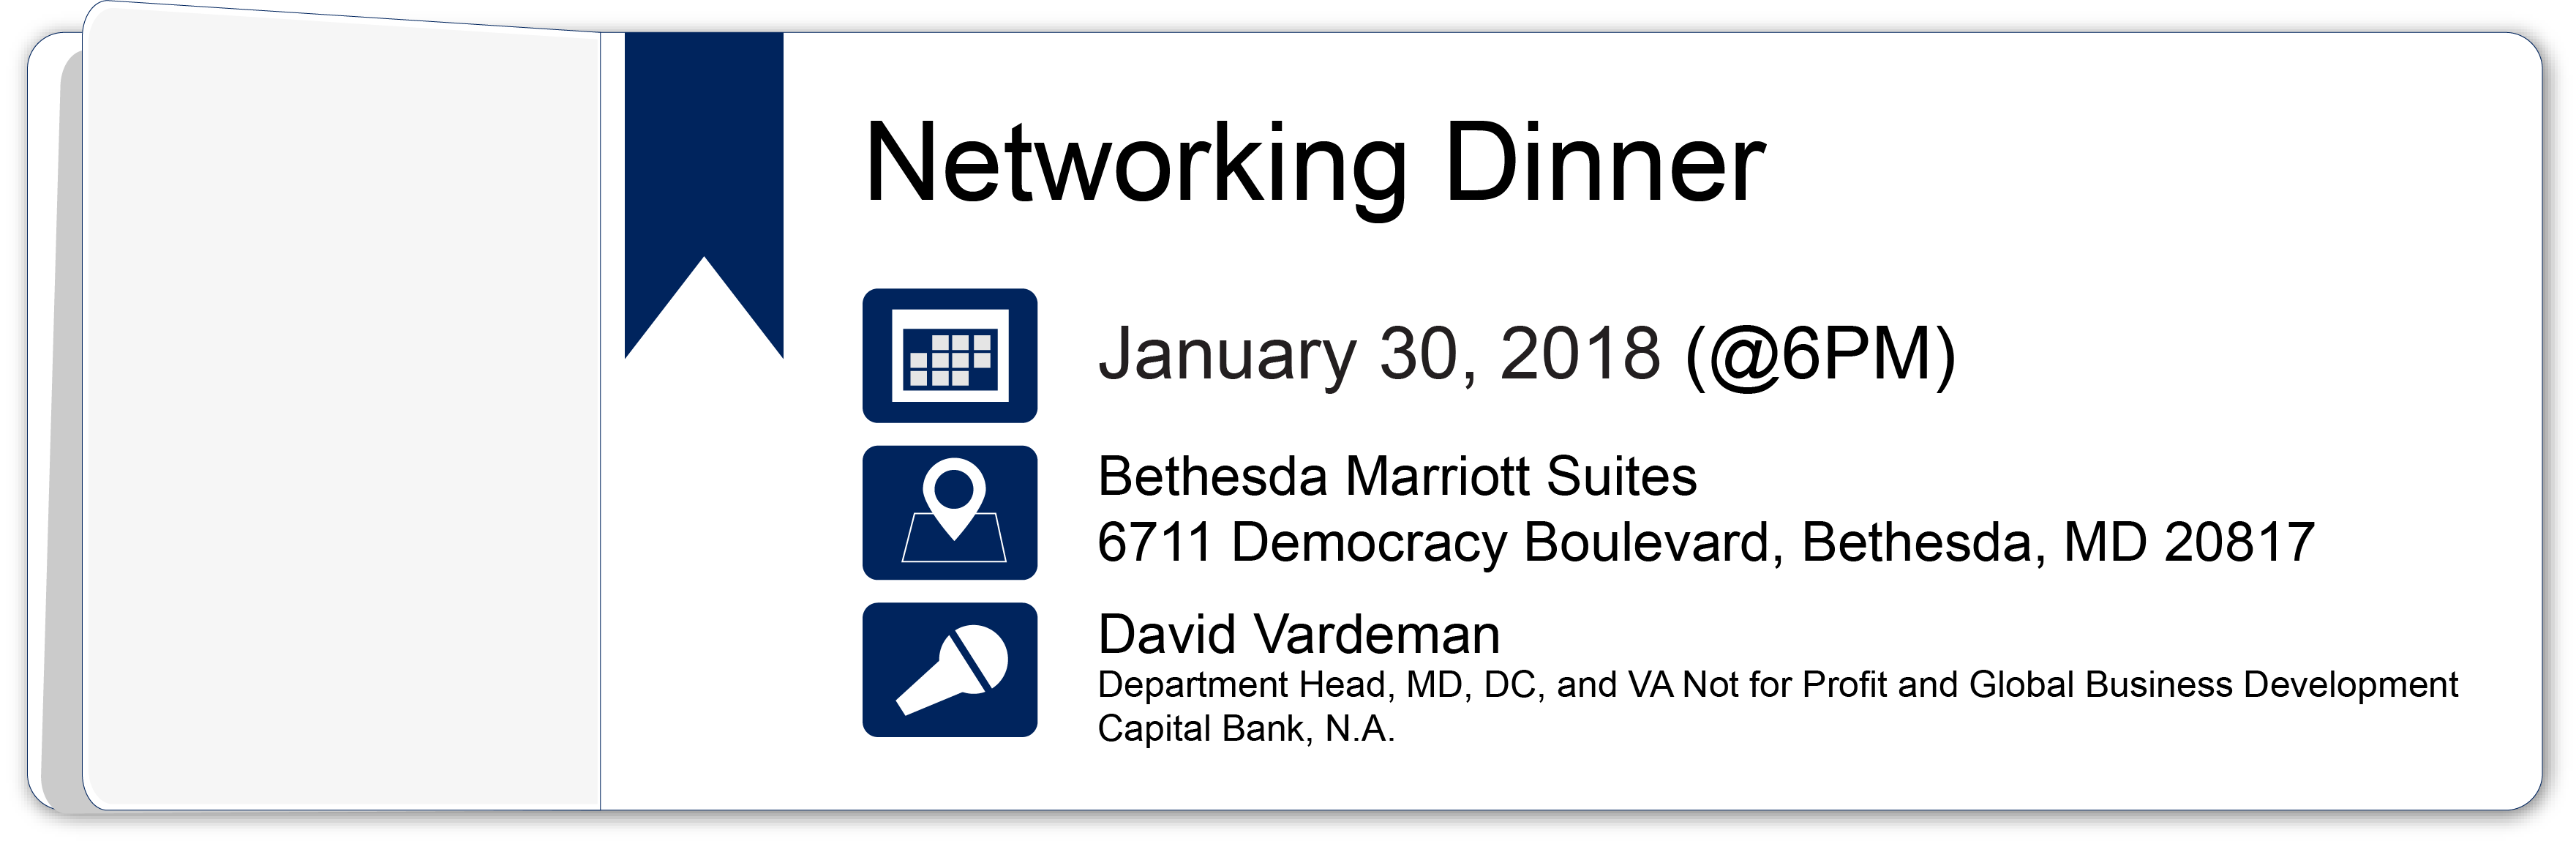 Networking Dinner – January 30, 2018